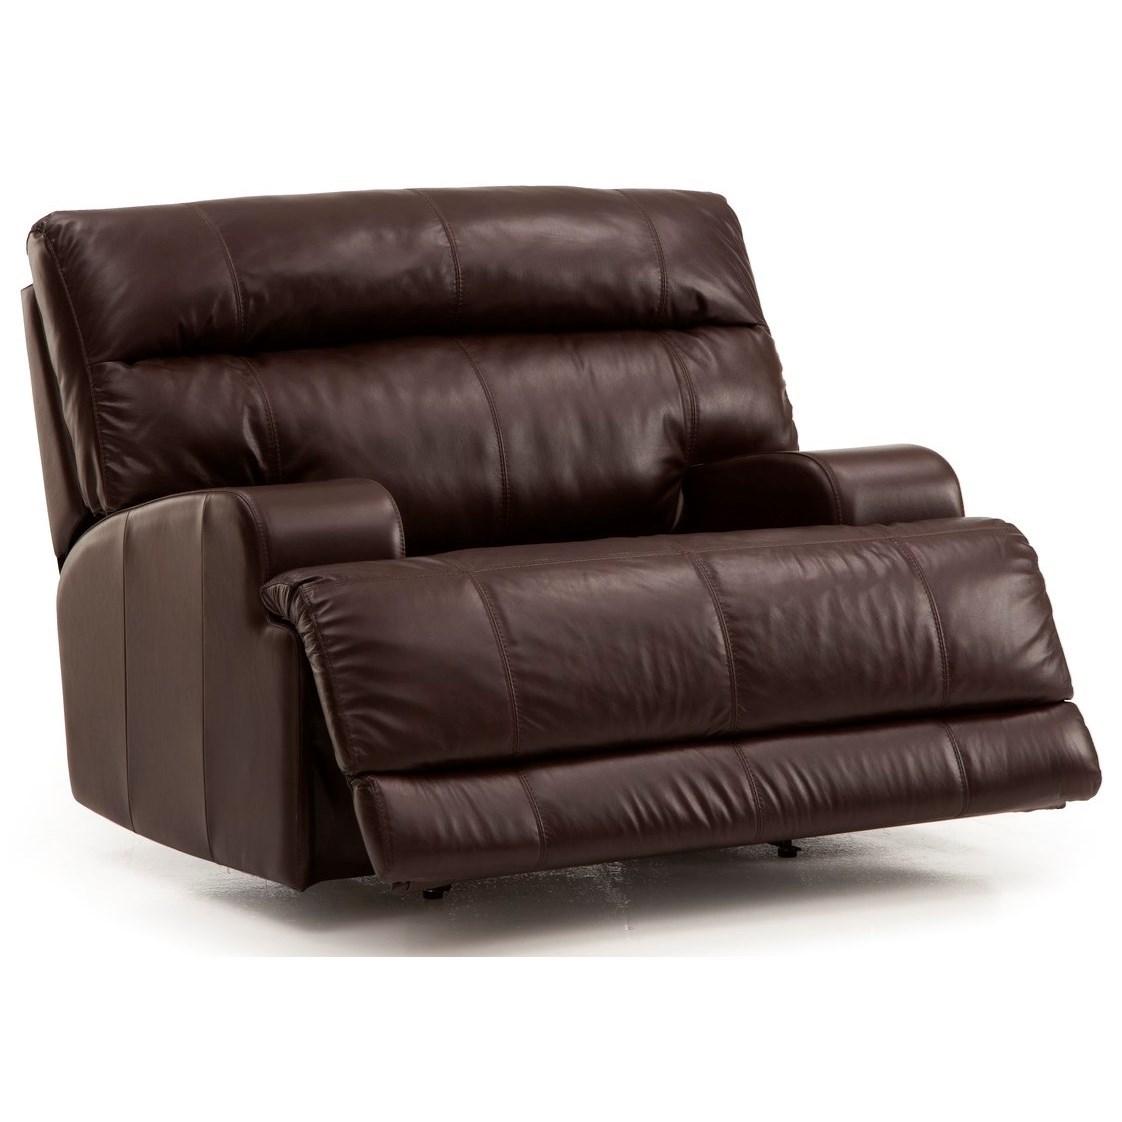 Cuddler Recliner Chair